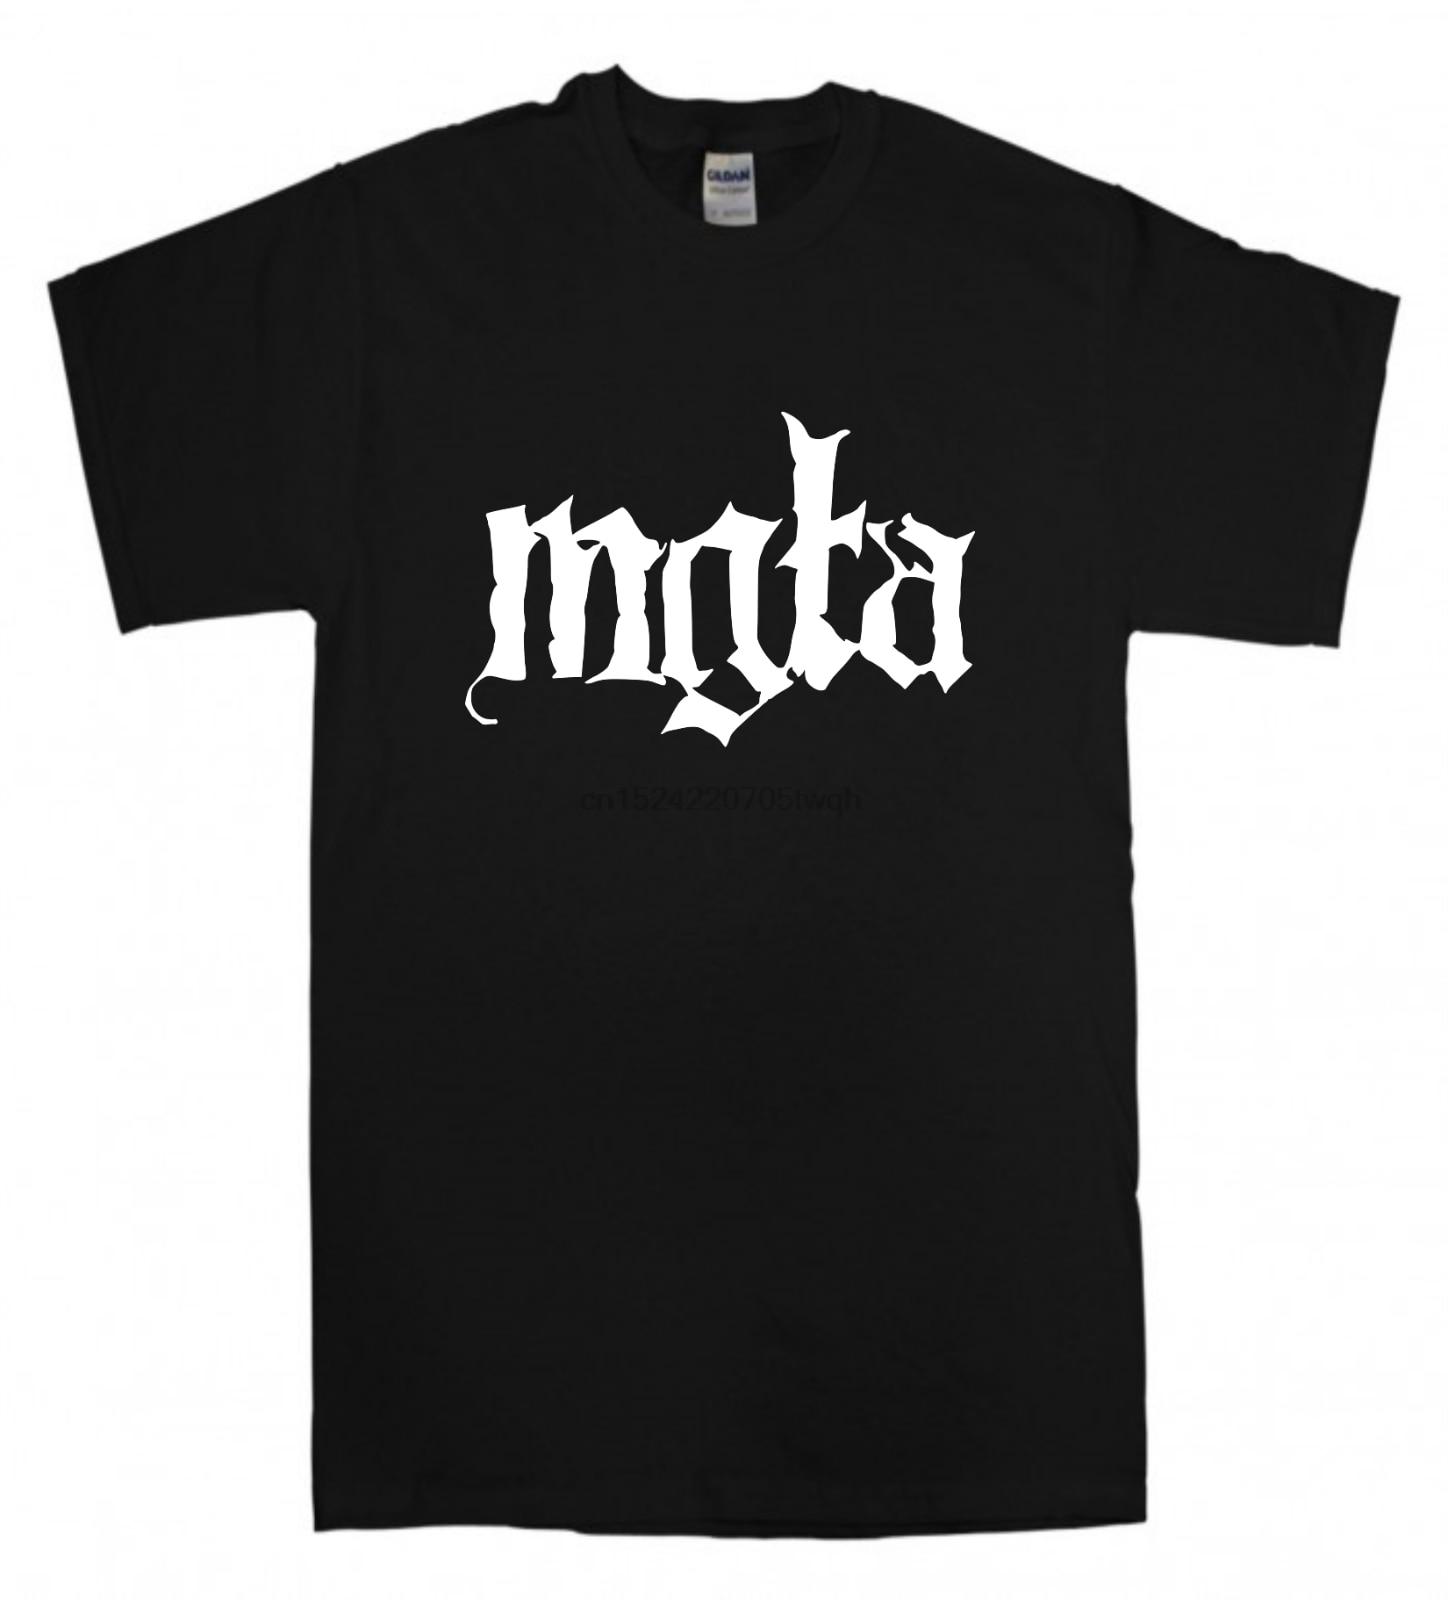 7074a49229 Mgla T-shirt New Black T shirt Black metal band Behemoth Emperor Dissection